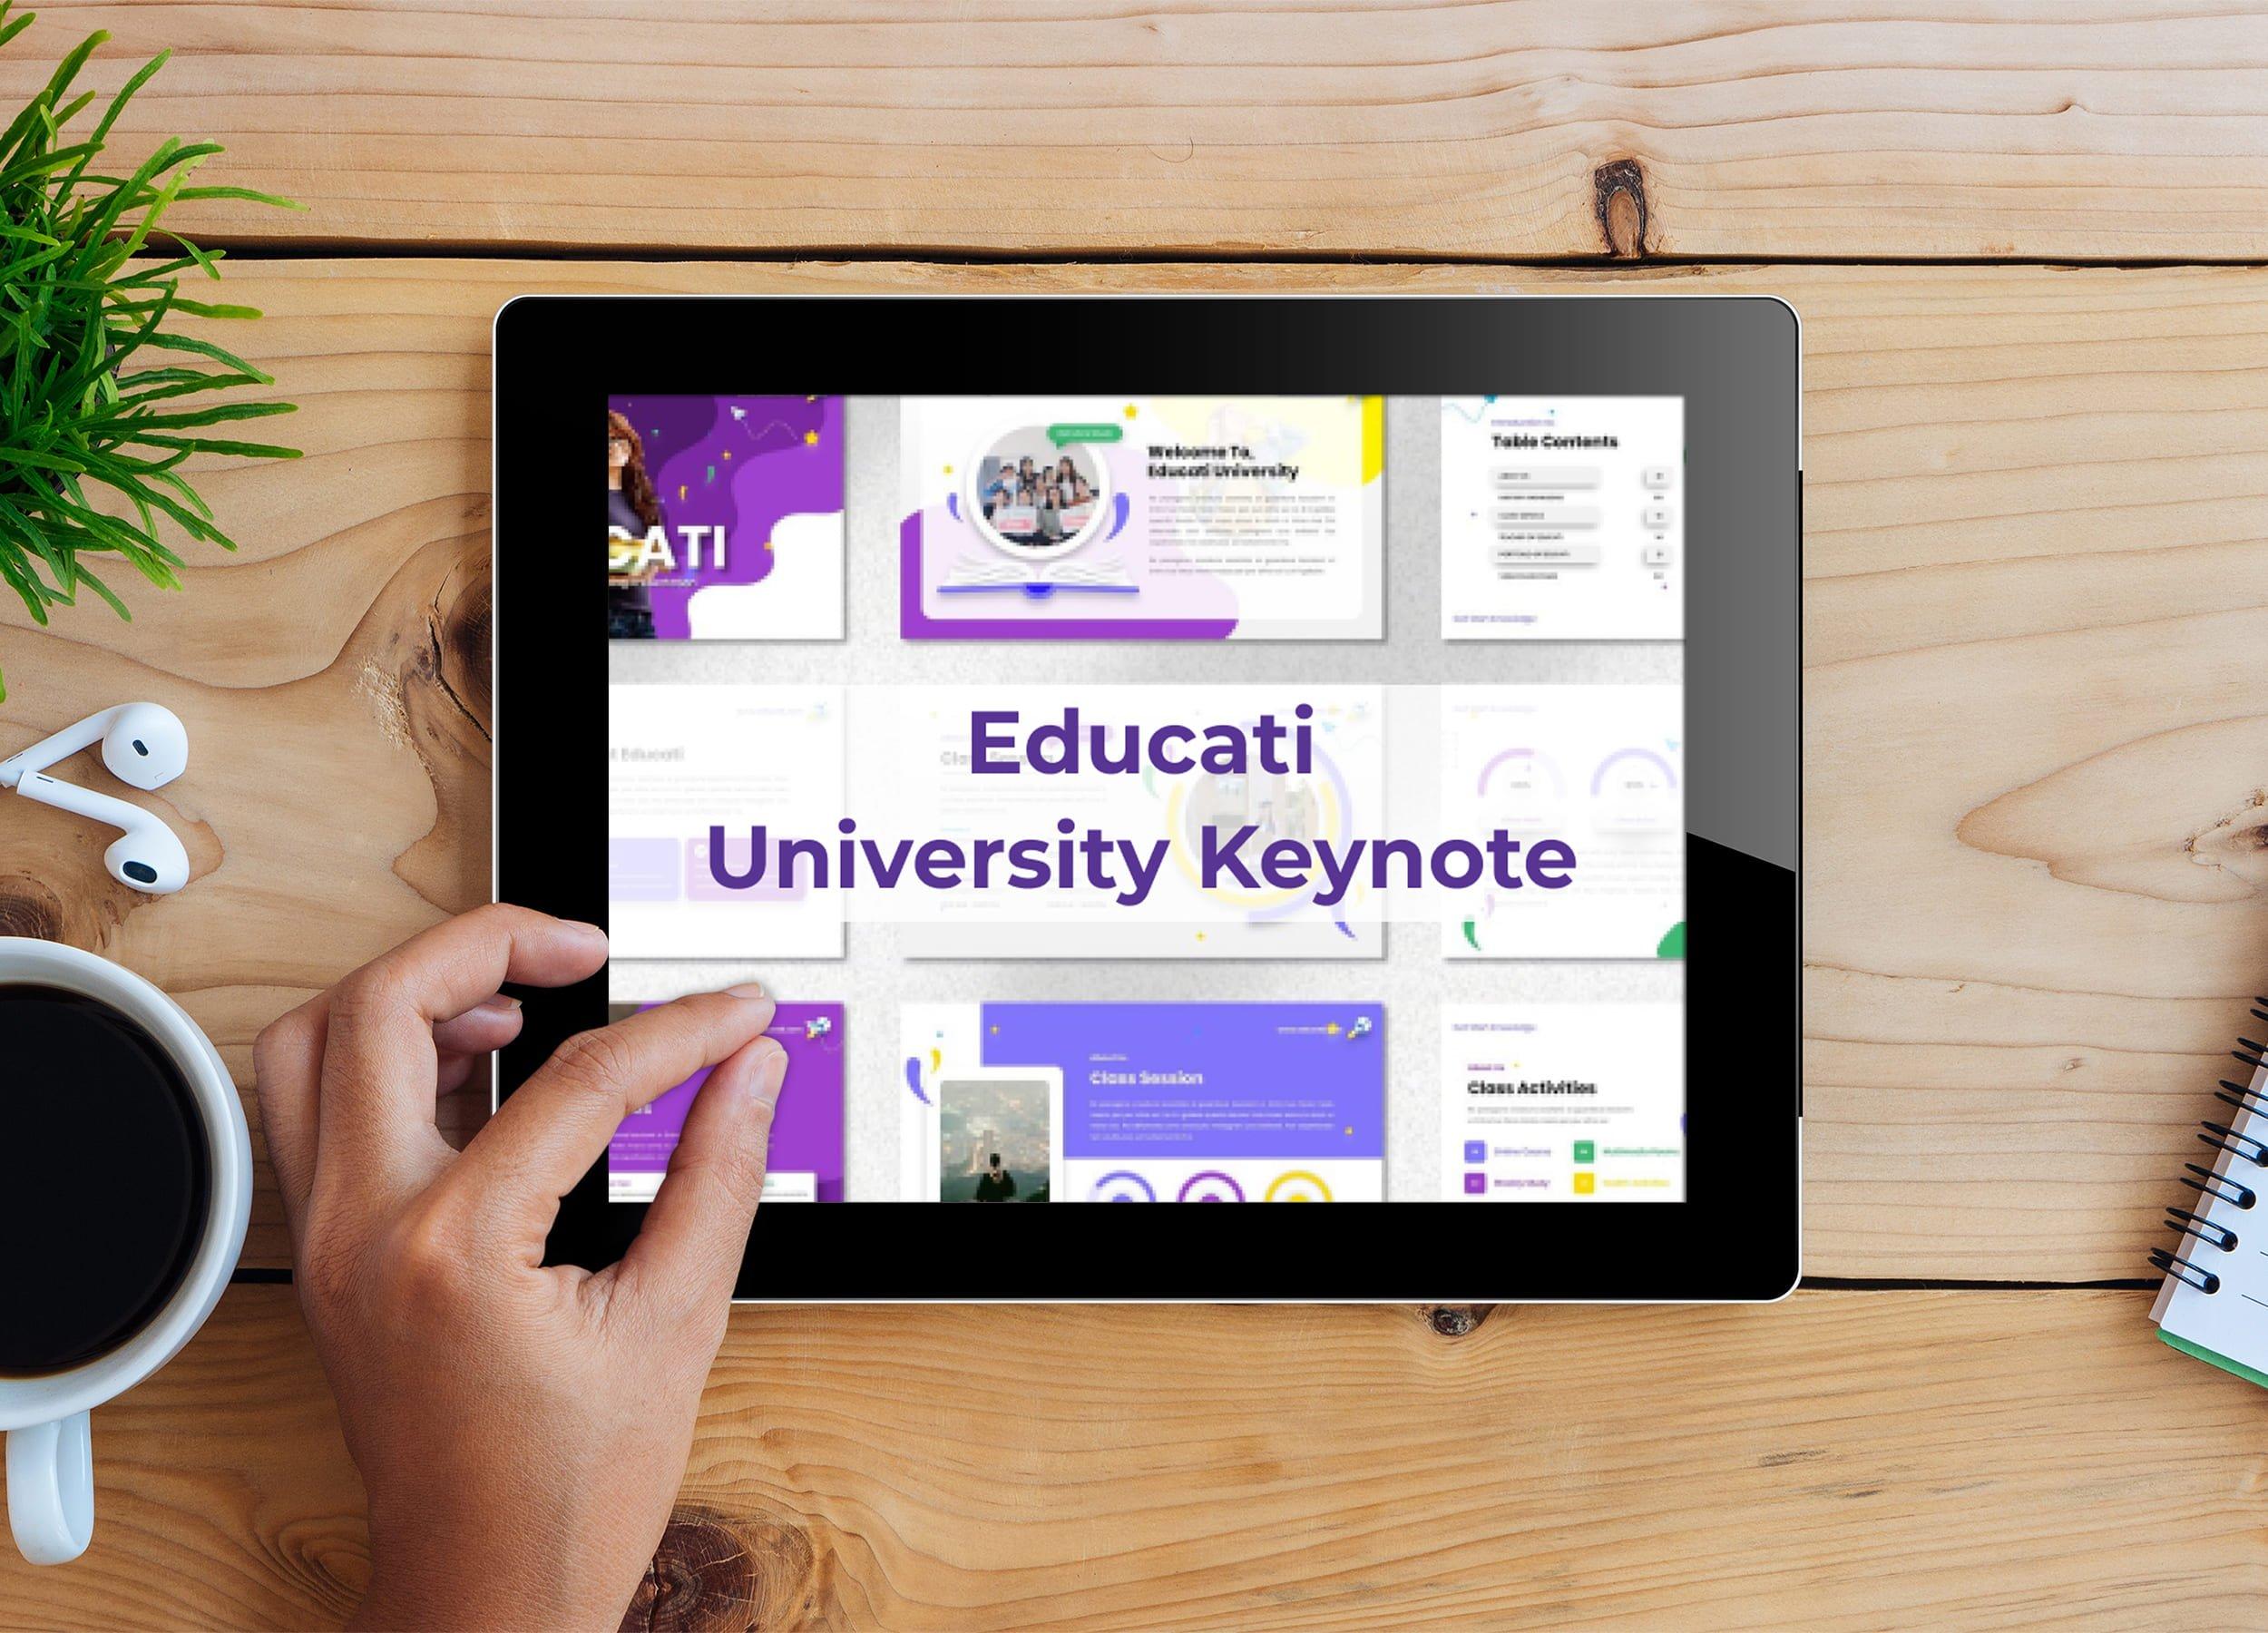 Tablet option of the Educati - University Keynote.